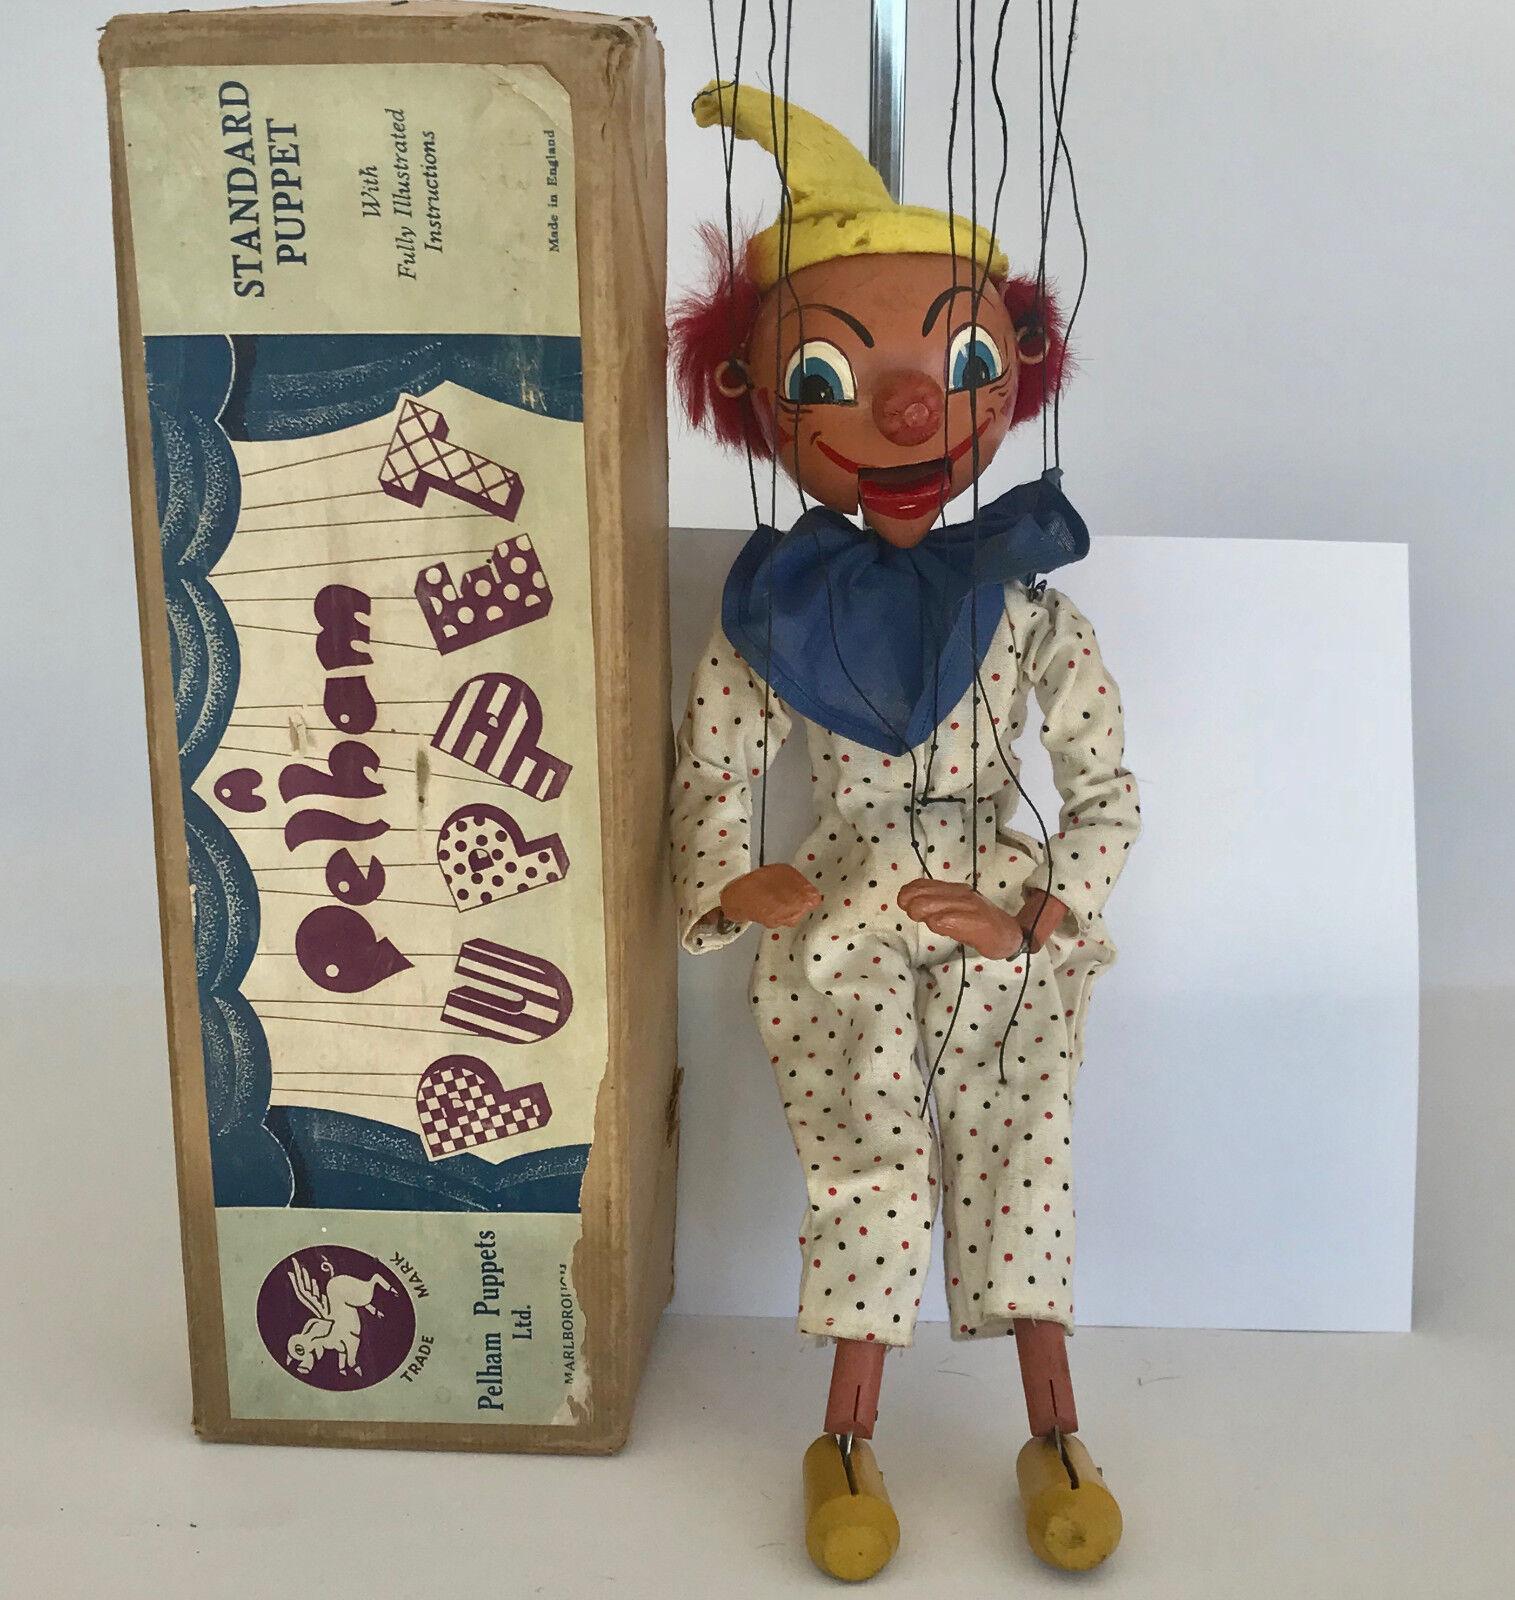 Pelham marioneta SM  Payaso , caja original de marrón, Vintag Circa 1950